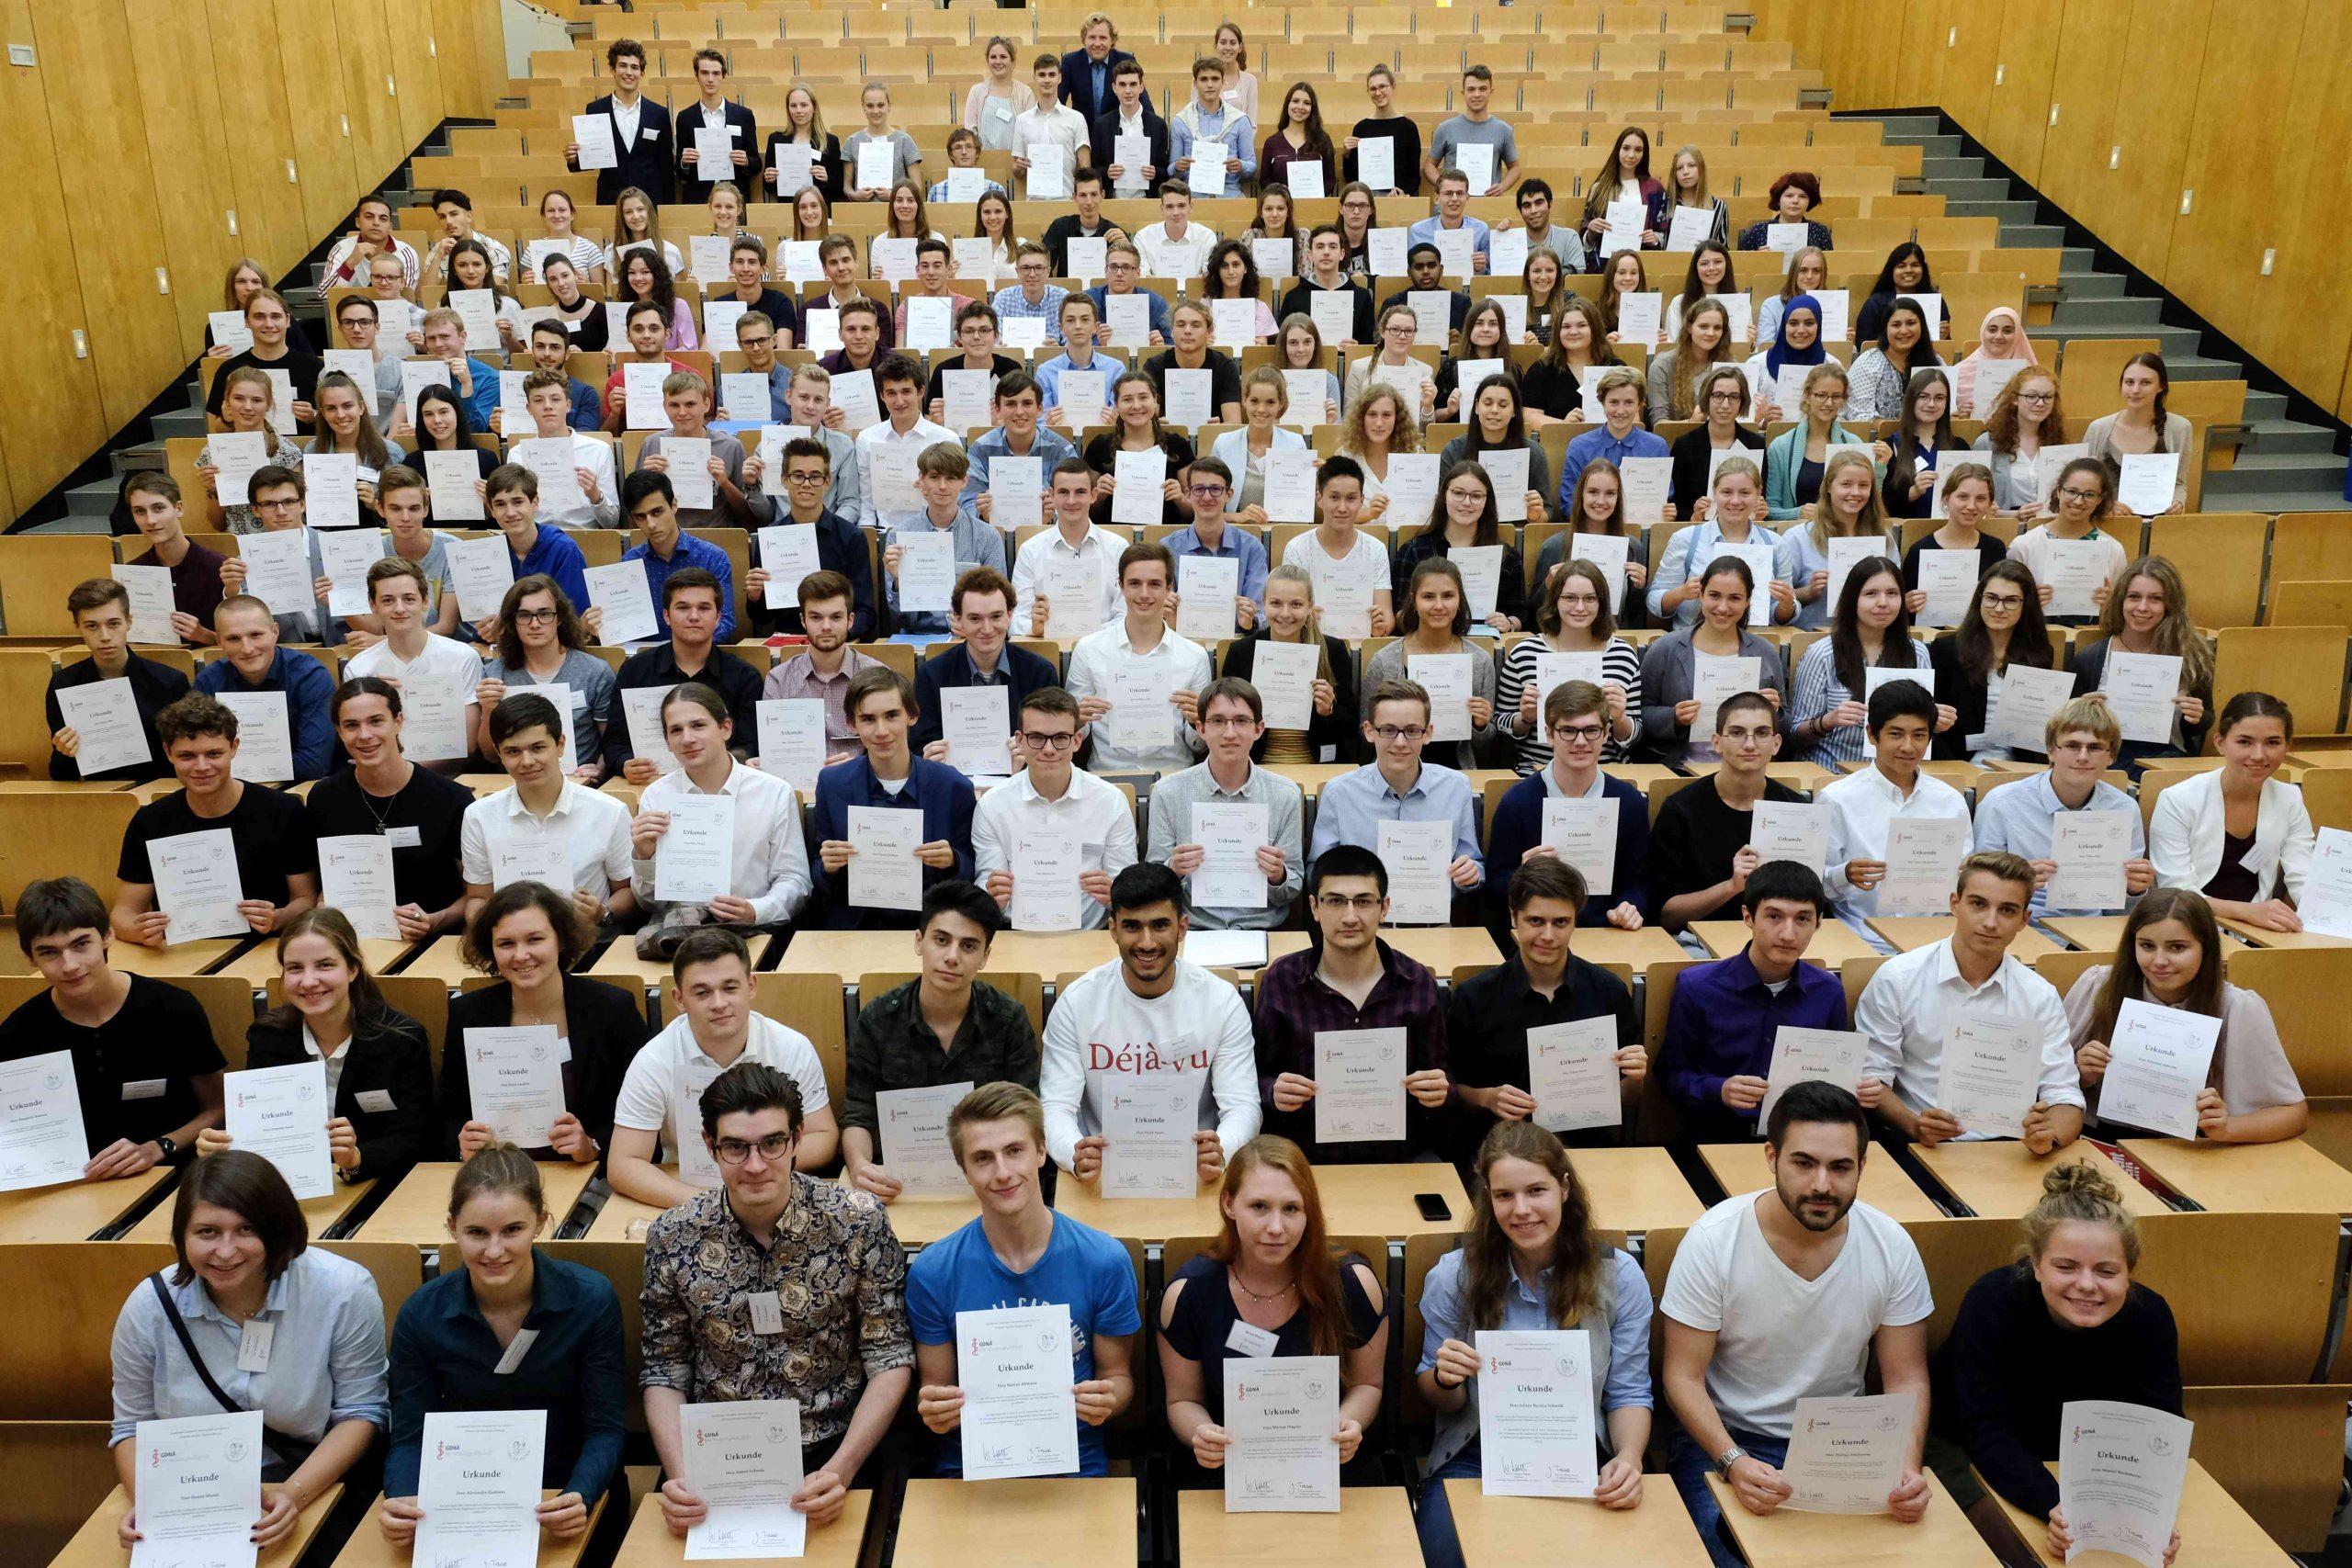 GDNÄ Schülerprogramm 2 scaled